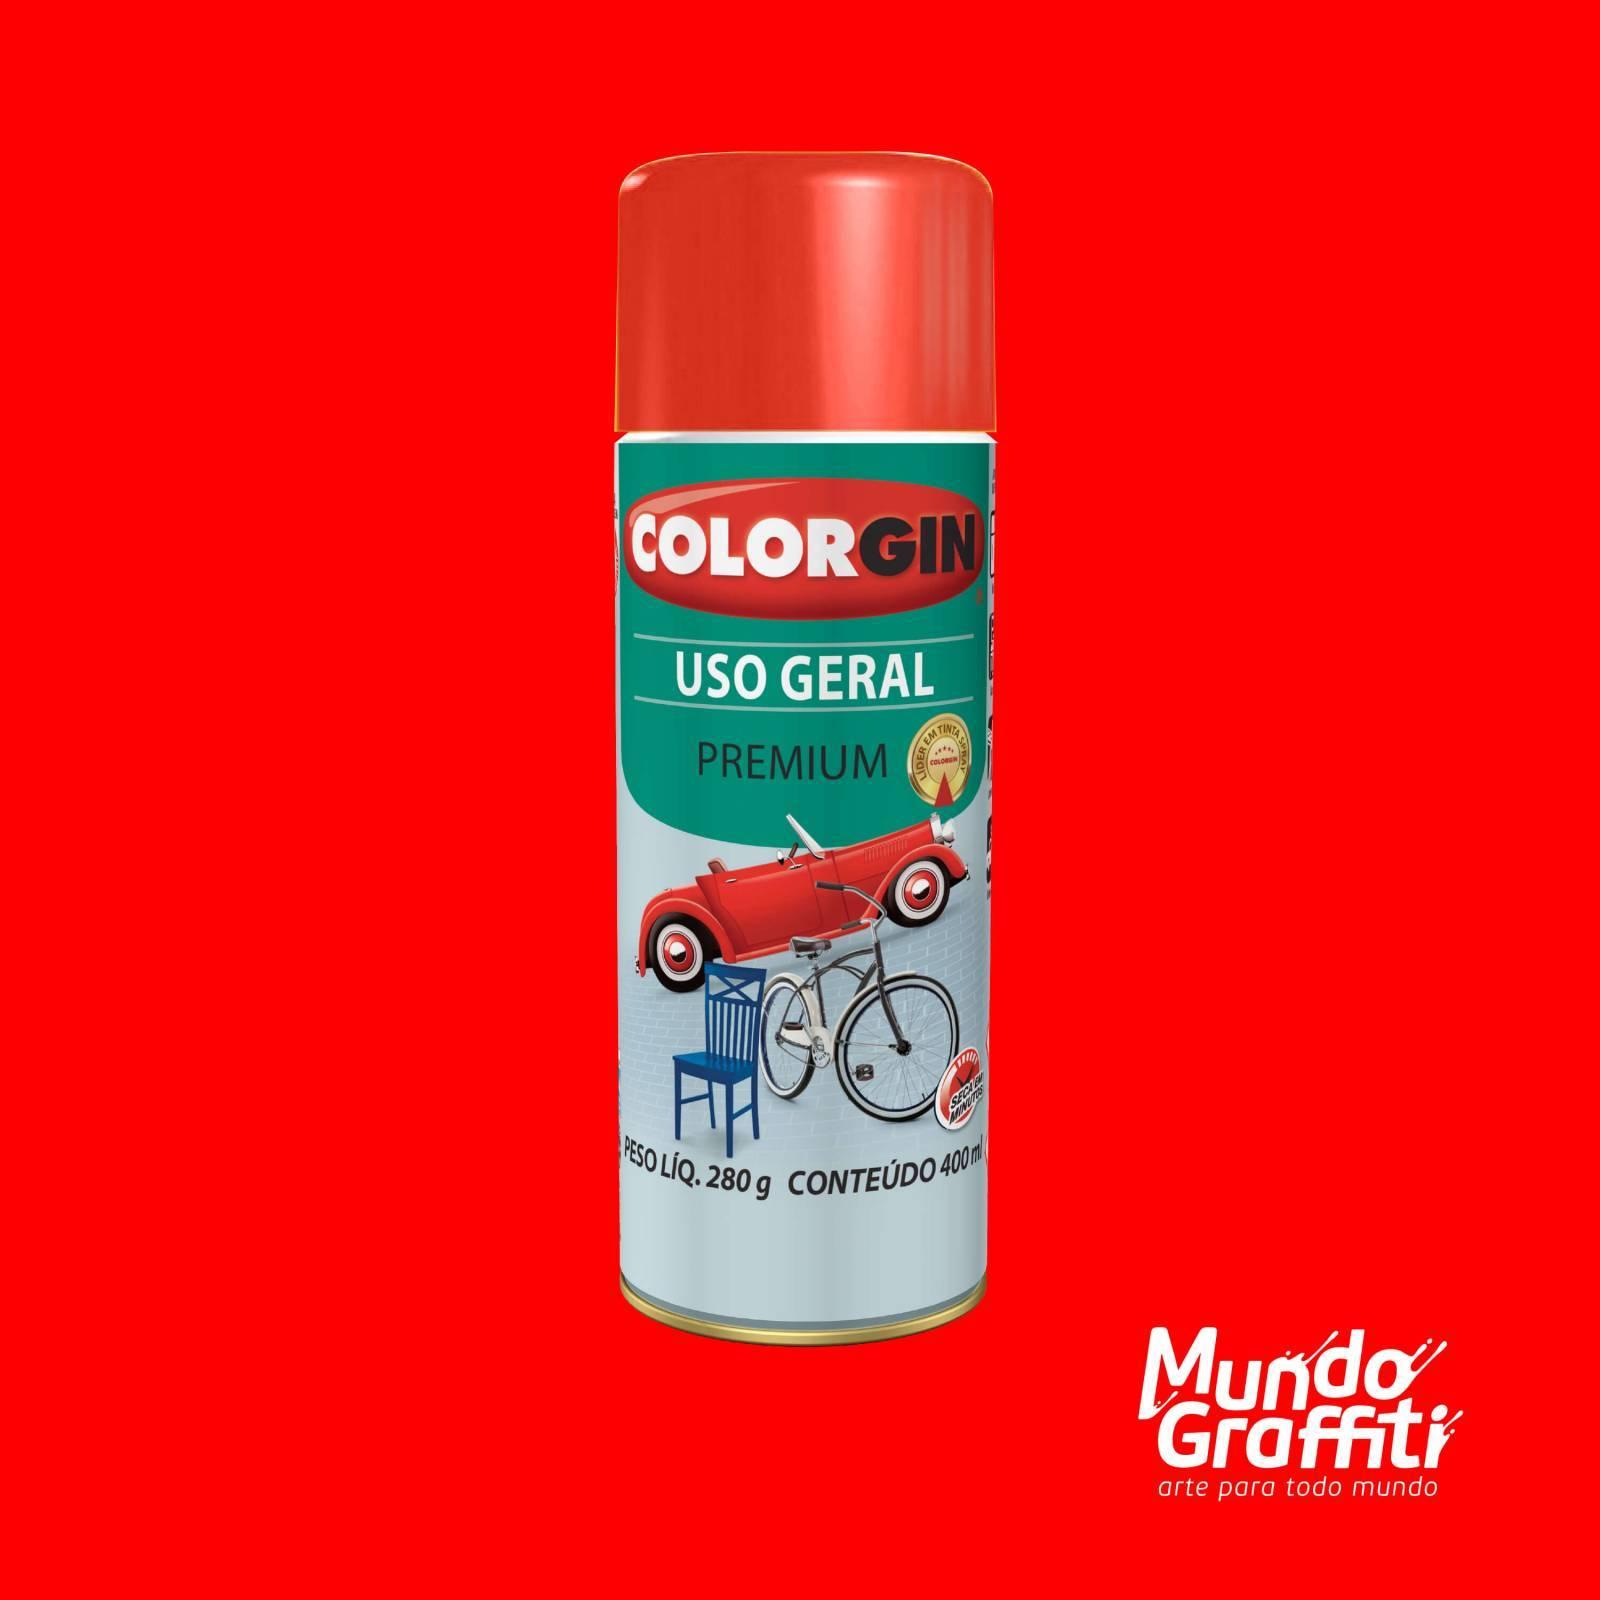 Tinta Spray Colorgin Uso Geral 55061 Vermelho 400ml - Mundo Graffiti